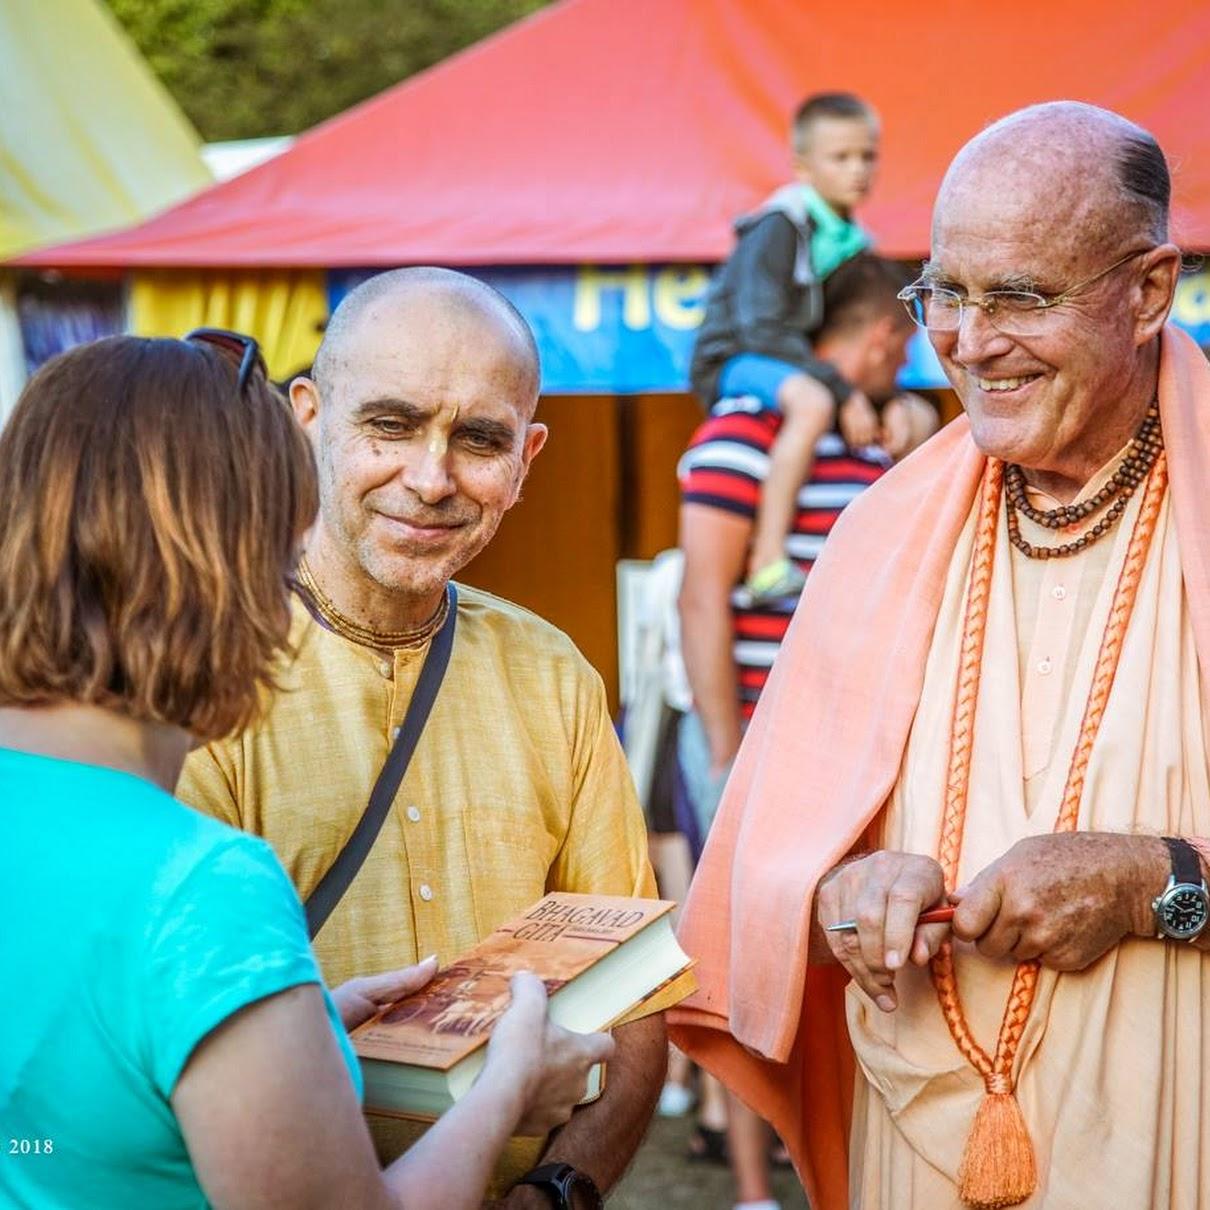 Indradyumna_Swami_Gita